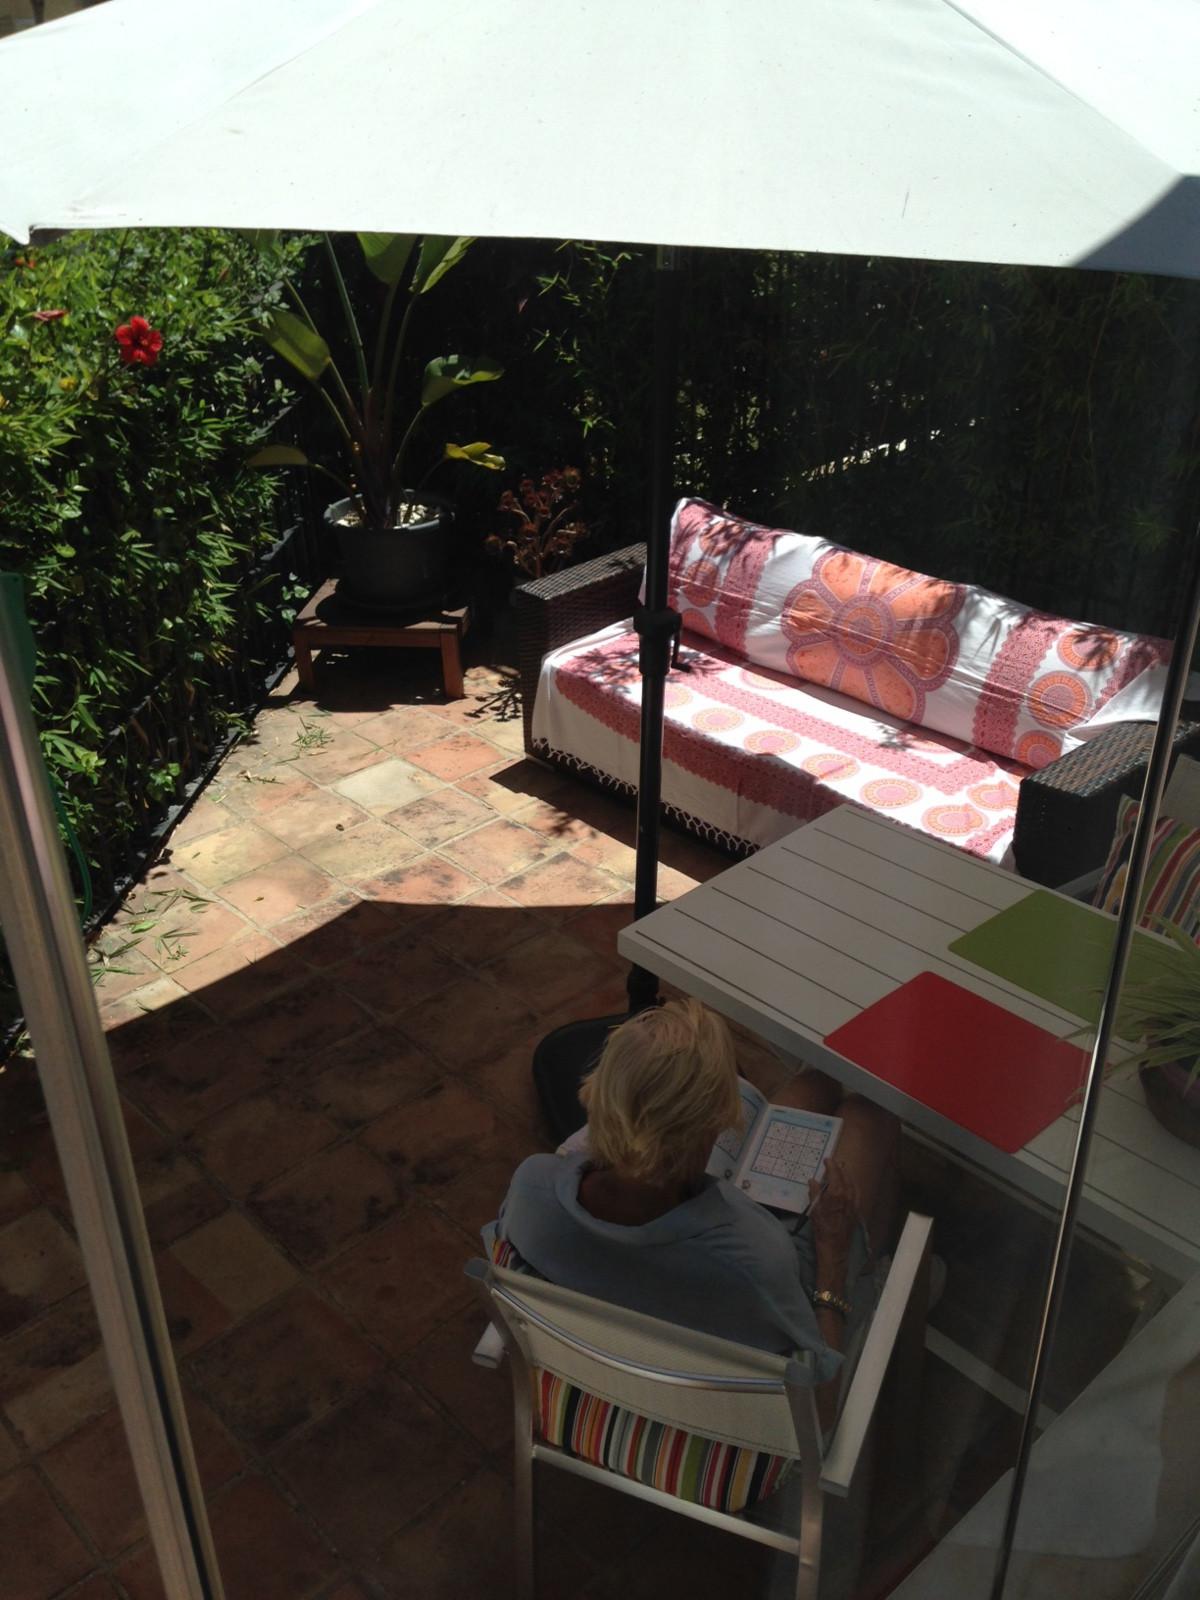 3 Bedroom Townhouse for sale Nagüeles